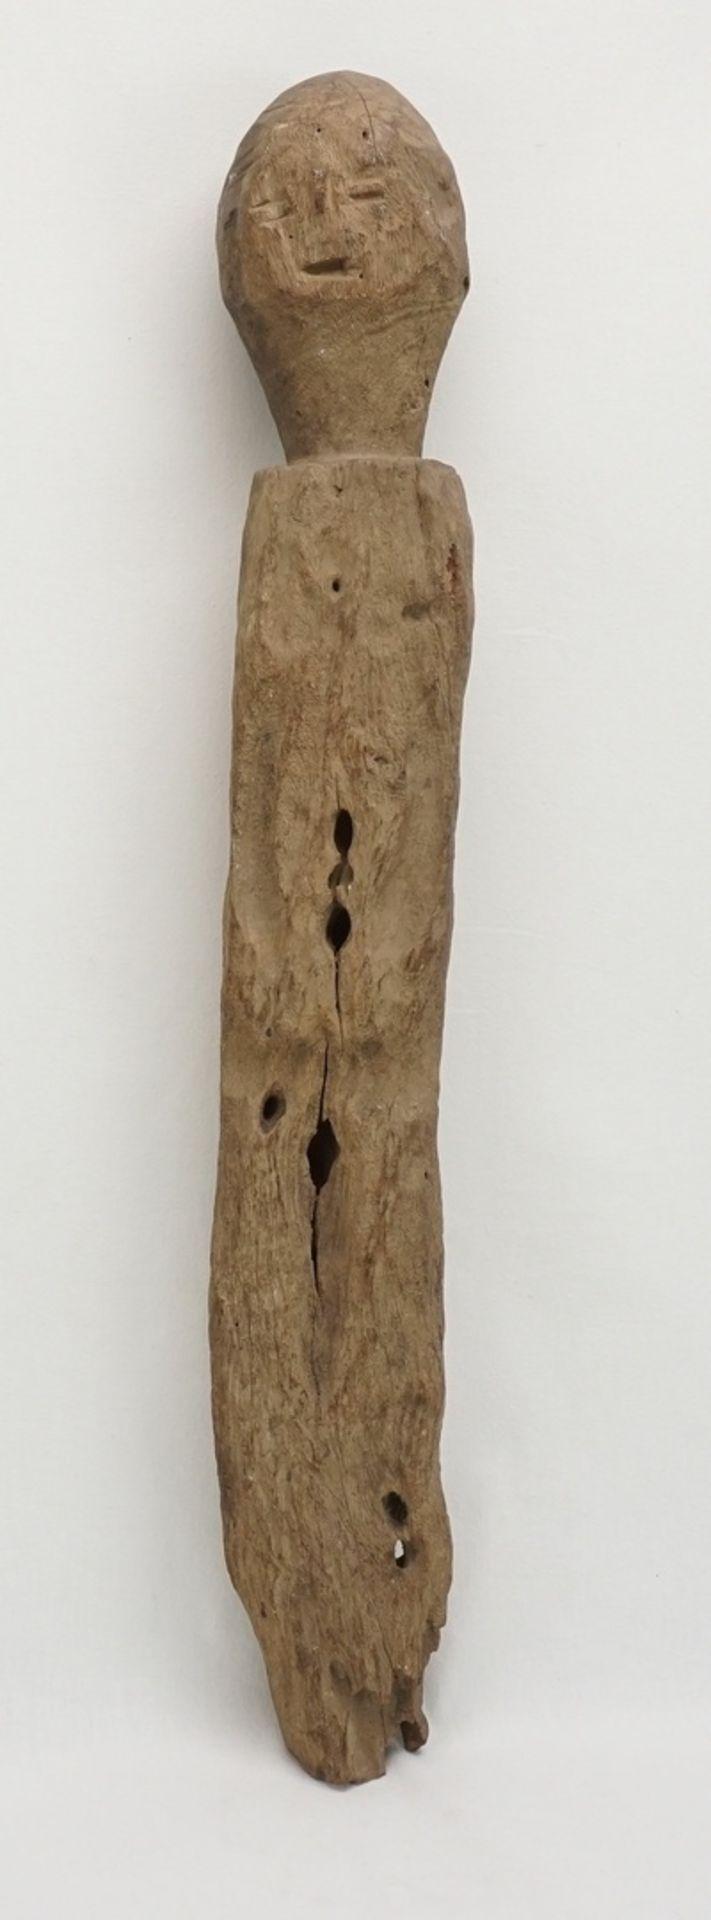 "Pfahlfigur ""bochio"", Benin, Fon, 1. Hälfte 20. Jh."